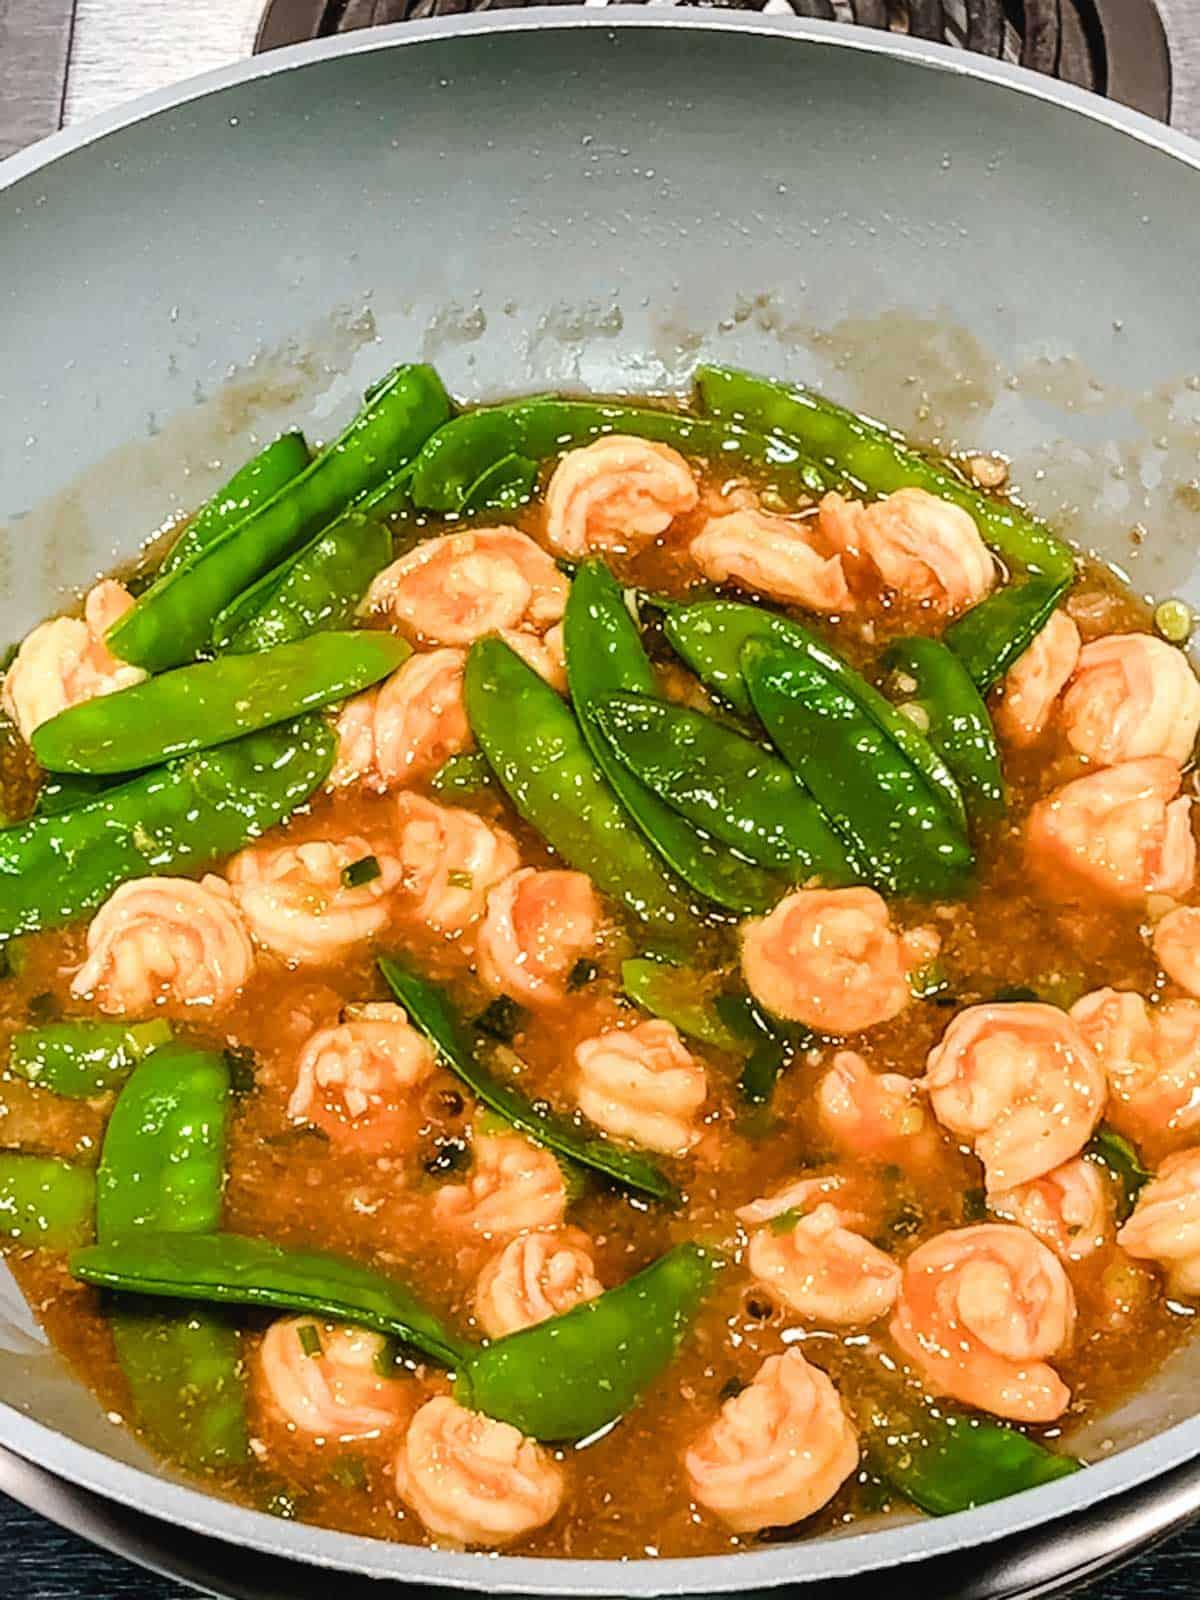 Stir Fry Shrimp with Snow Peas ready to serve.